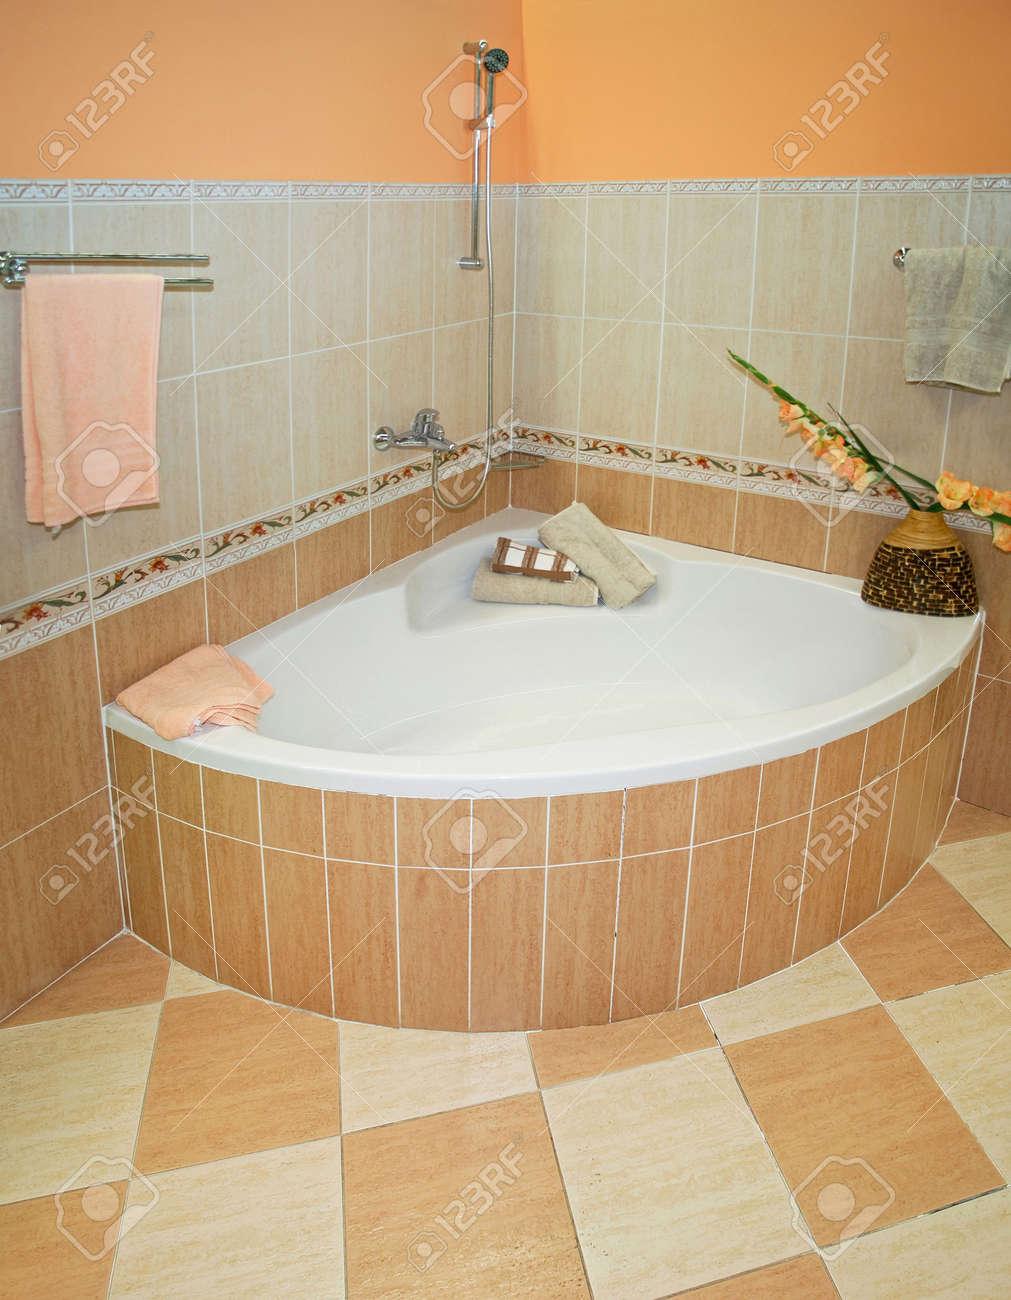 Bathroom with corner tub - Bathroom With Corner Bath Tub And Decorative Ceramics Stock Photo